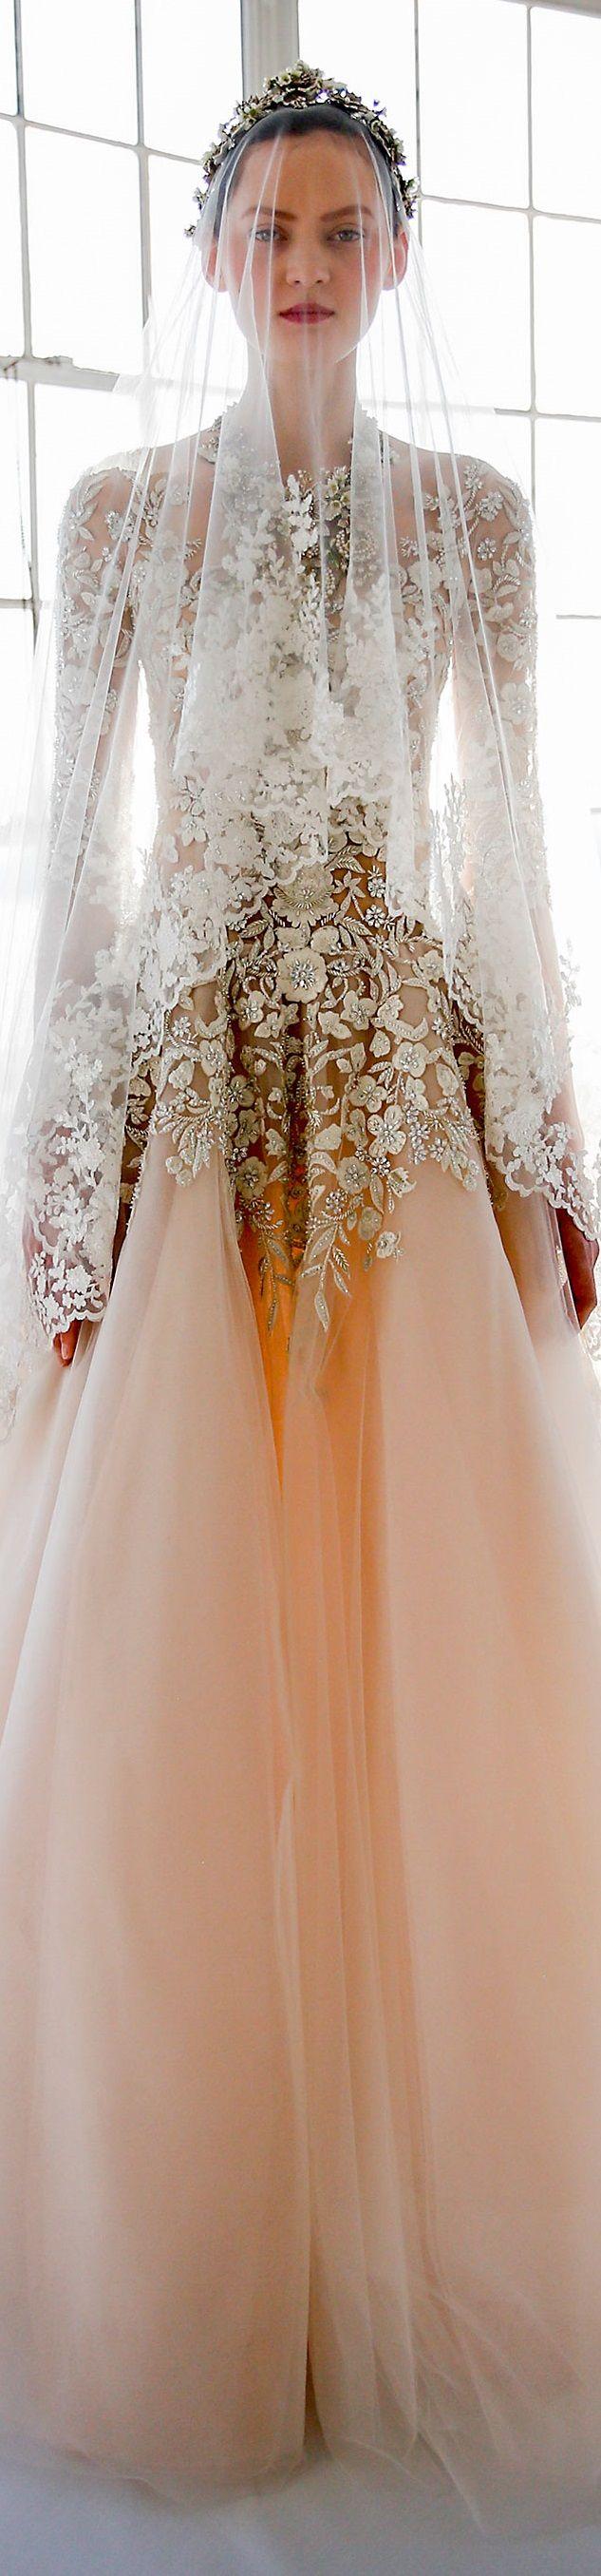 Marchesa Wedding Dress ~ Spring 2017  #vestidodenovia | #trajesdenovio | vestidos de novia para gorditas | vestidos de novia cortos  http://amzn.to/29aGZWo